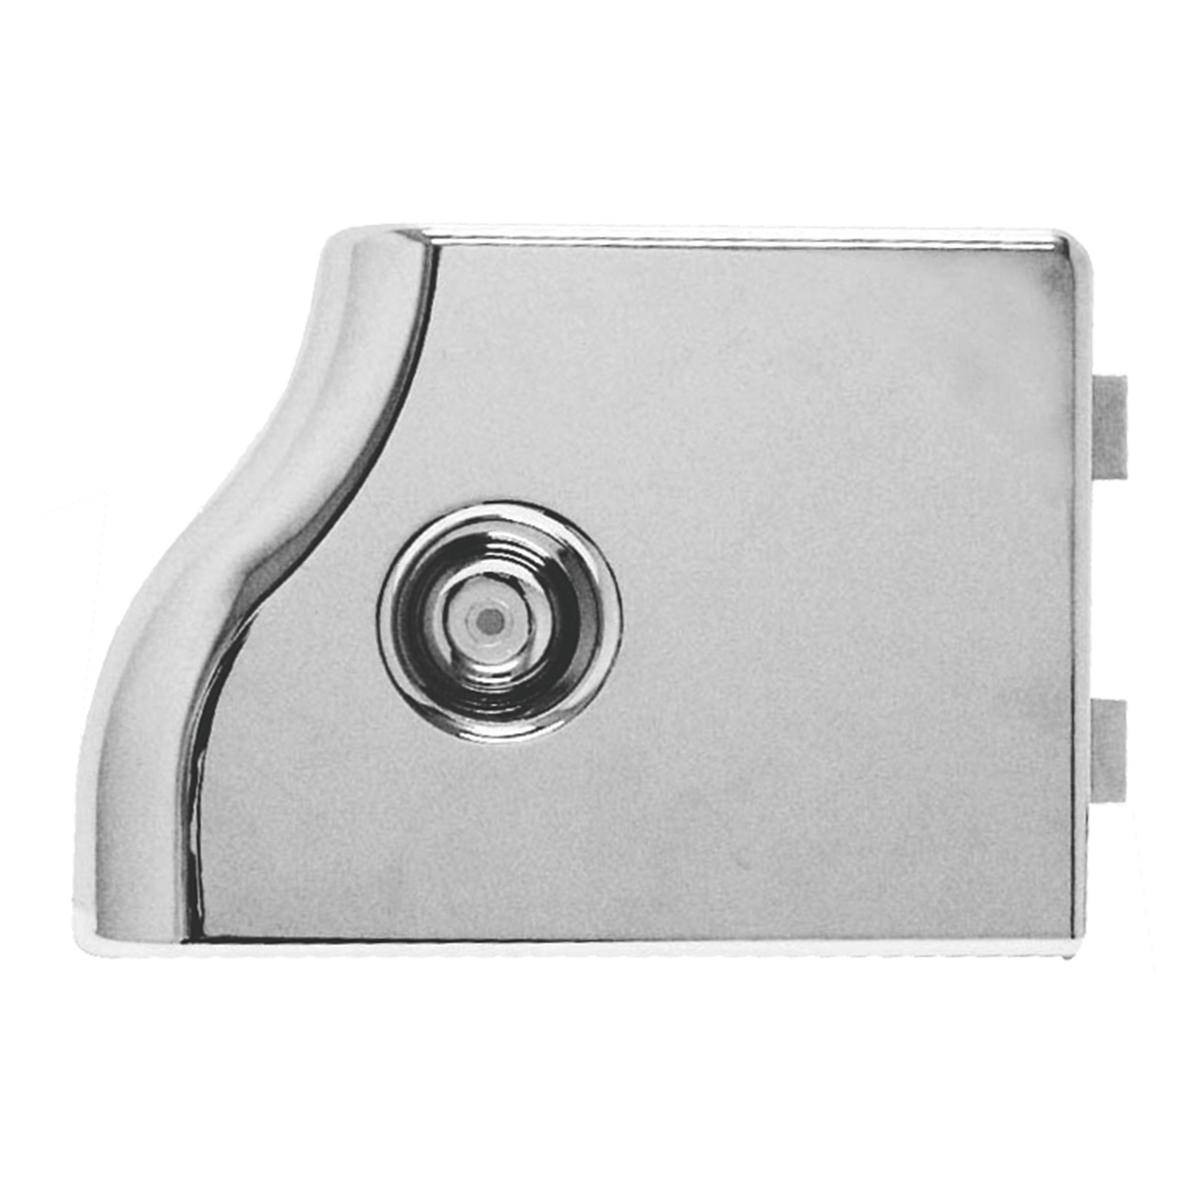 68341 Chrome Plastic A/C Filter Door for Peterbilt